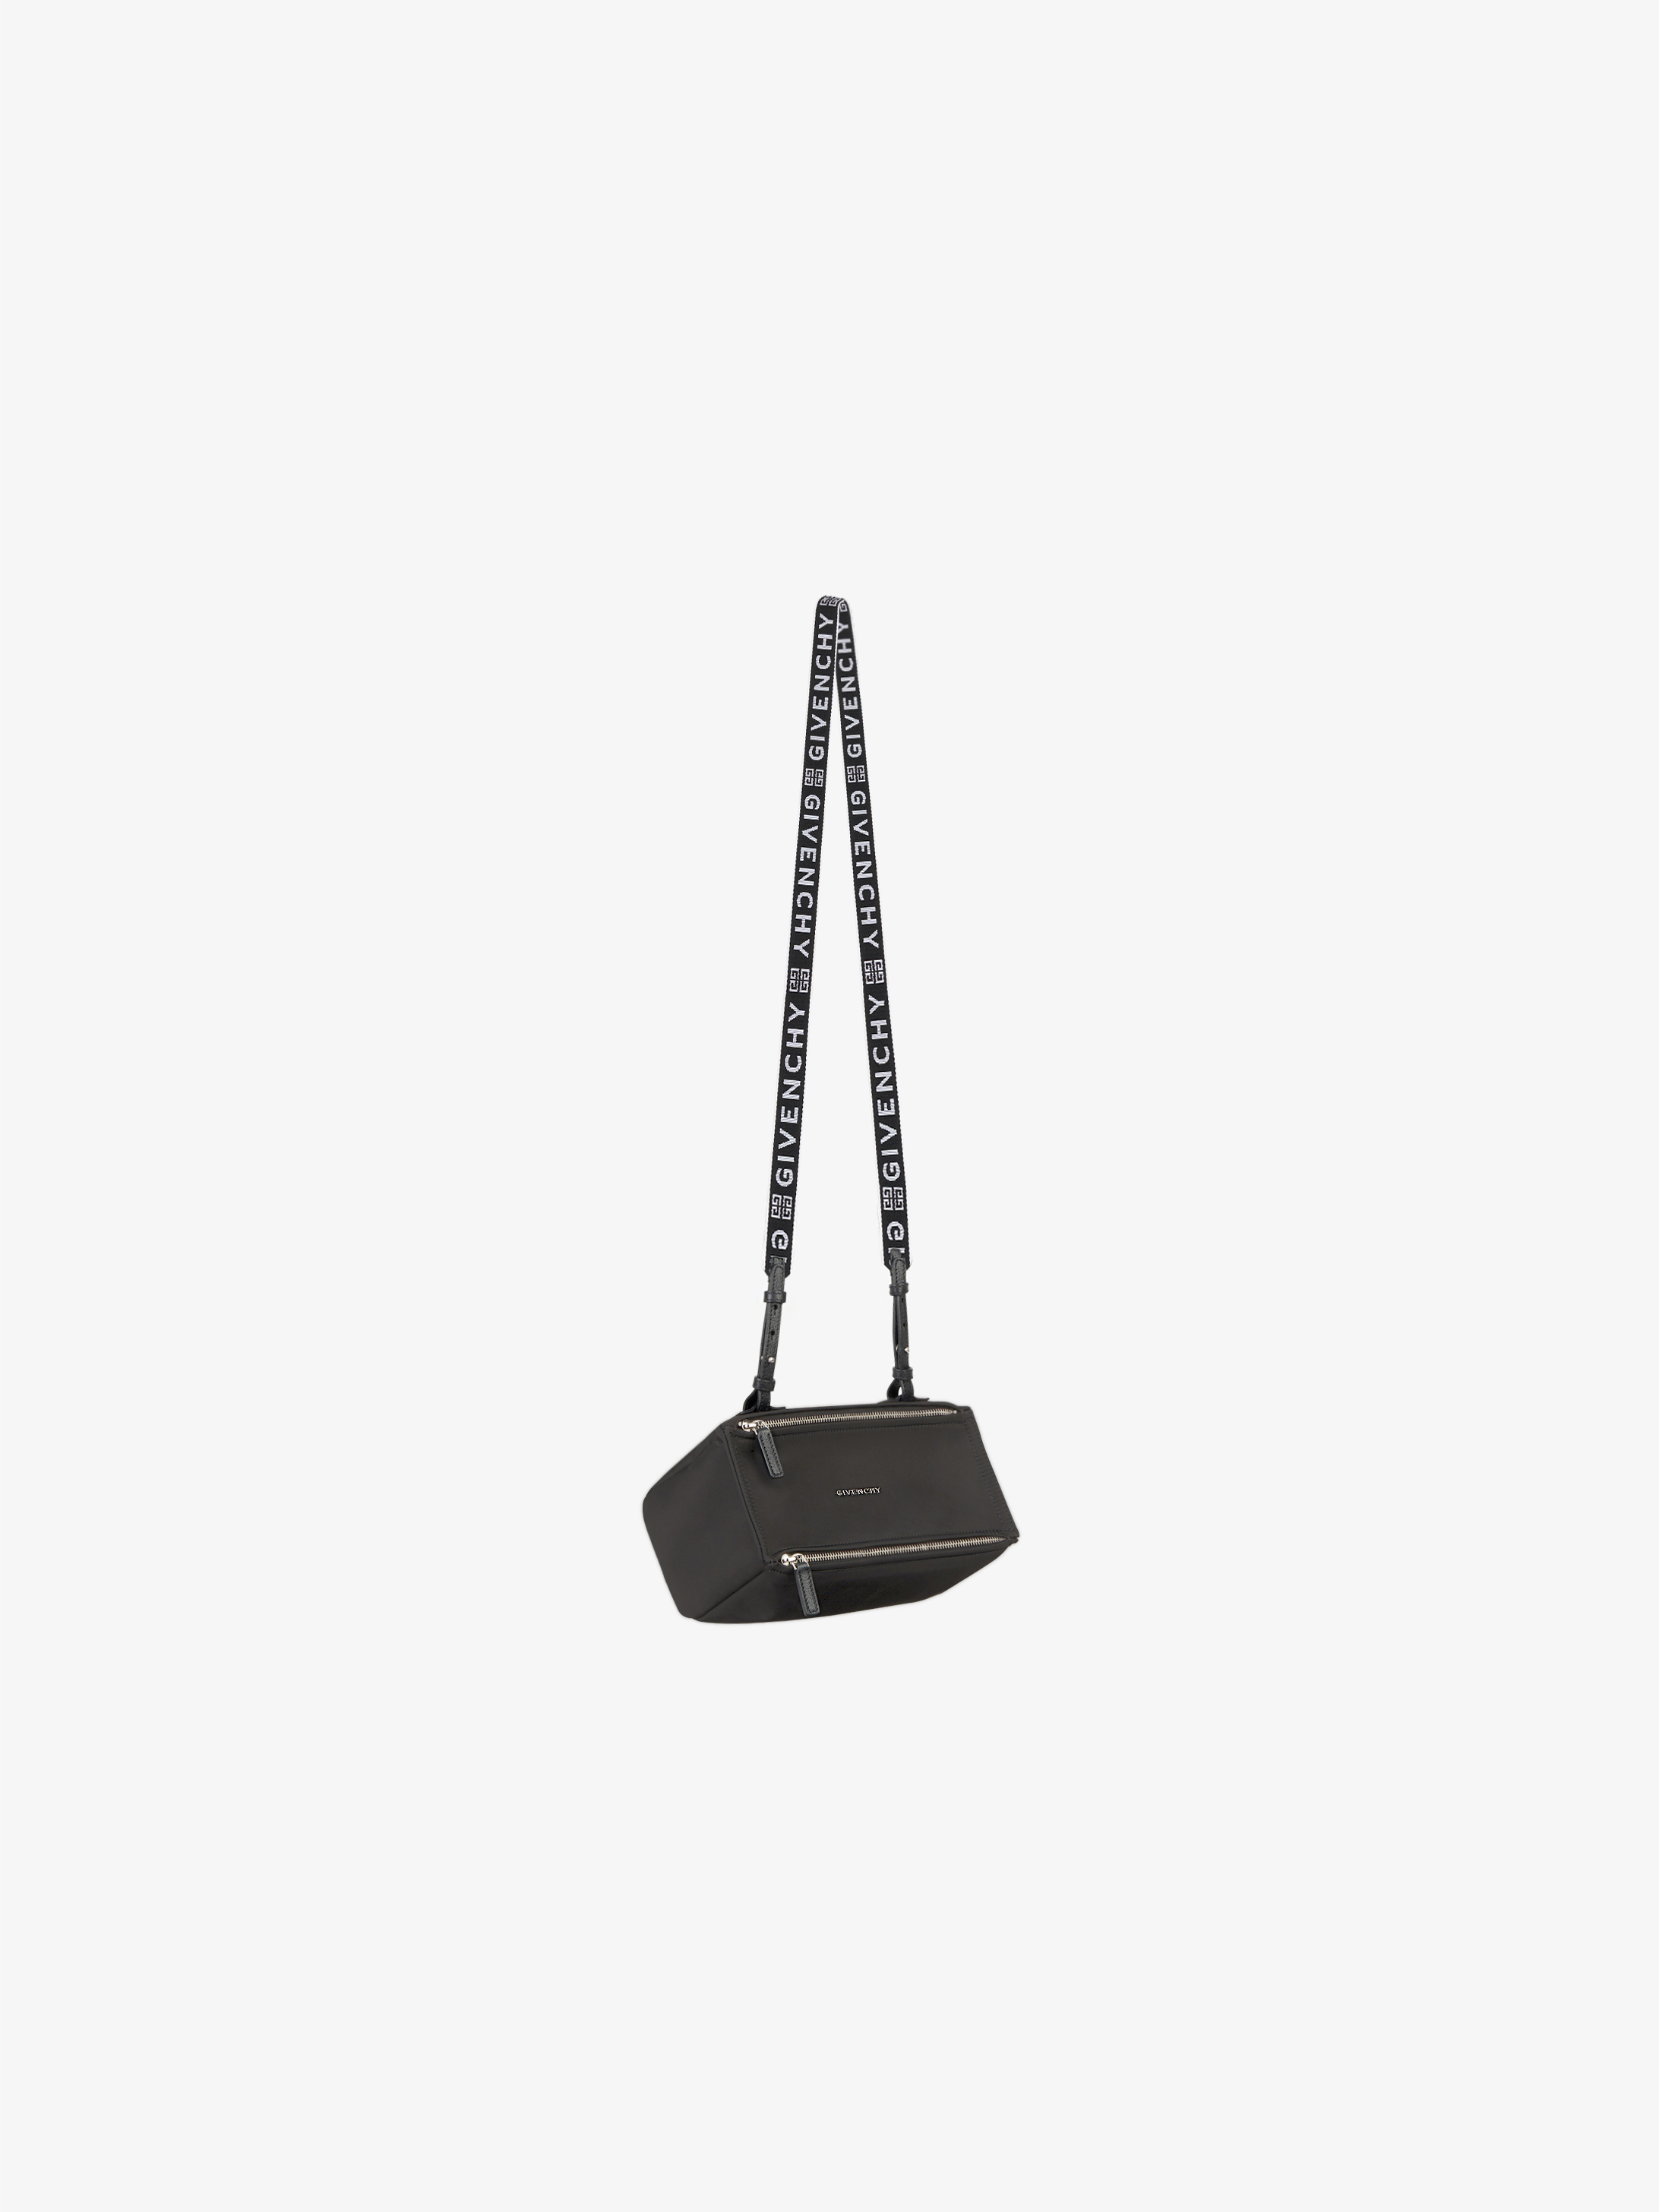 0ca3871ec5 GIVENCHY 4G mini Pandora bag in nylon | GIVENCHY Paris